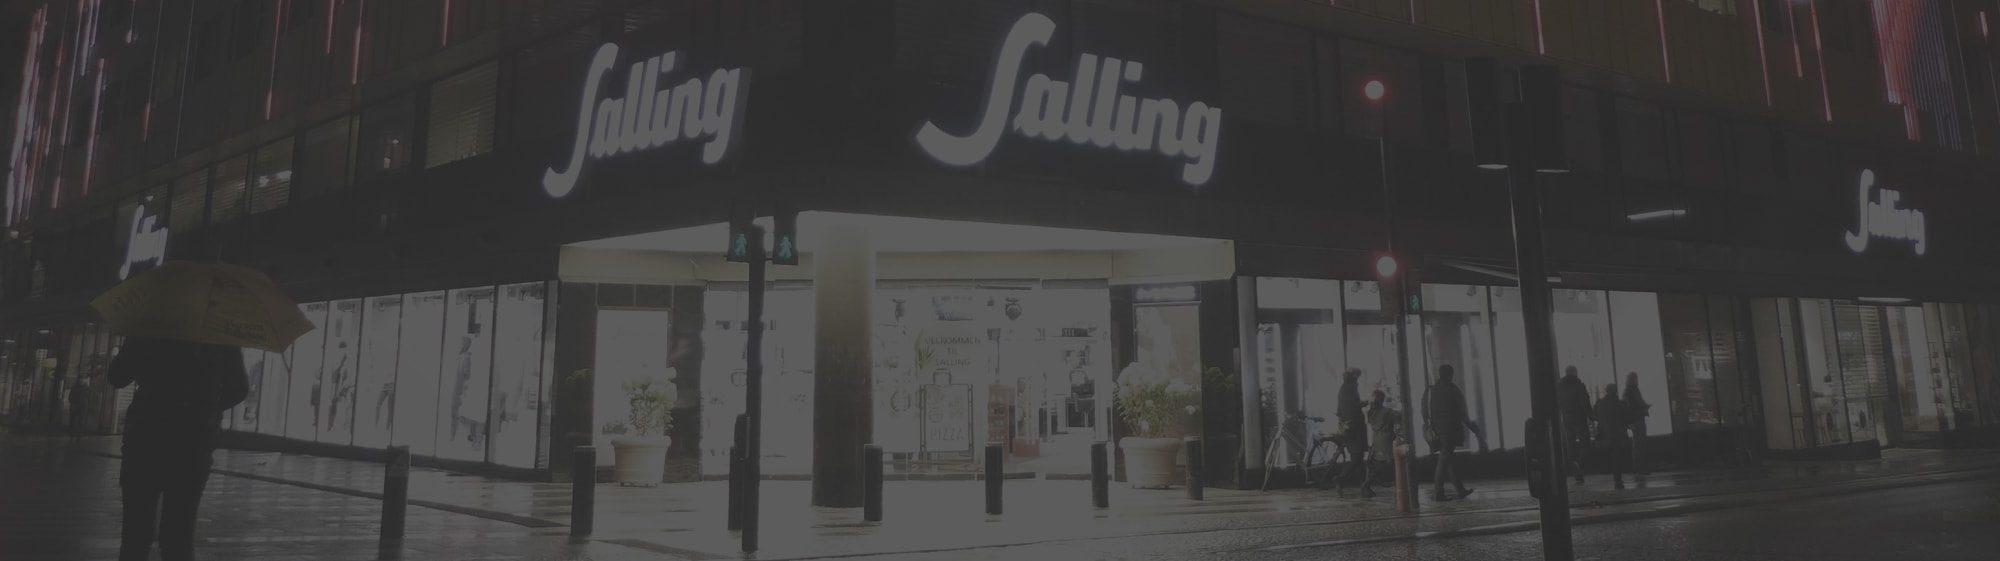 Salling-banner